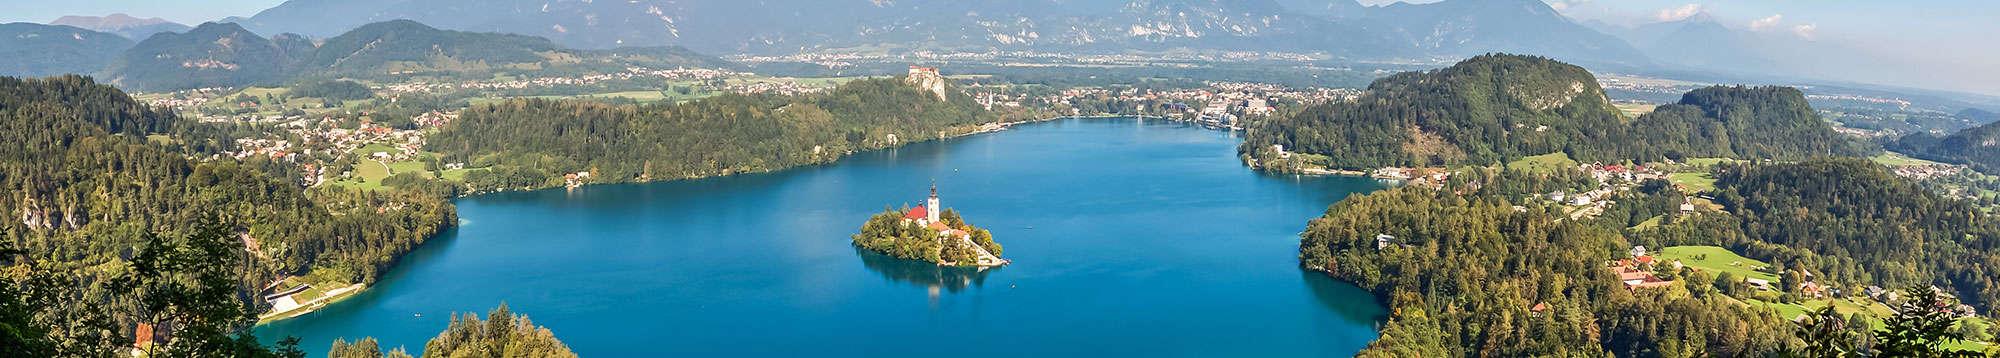 Week-end et séjour Slovénie